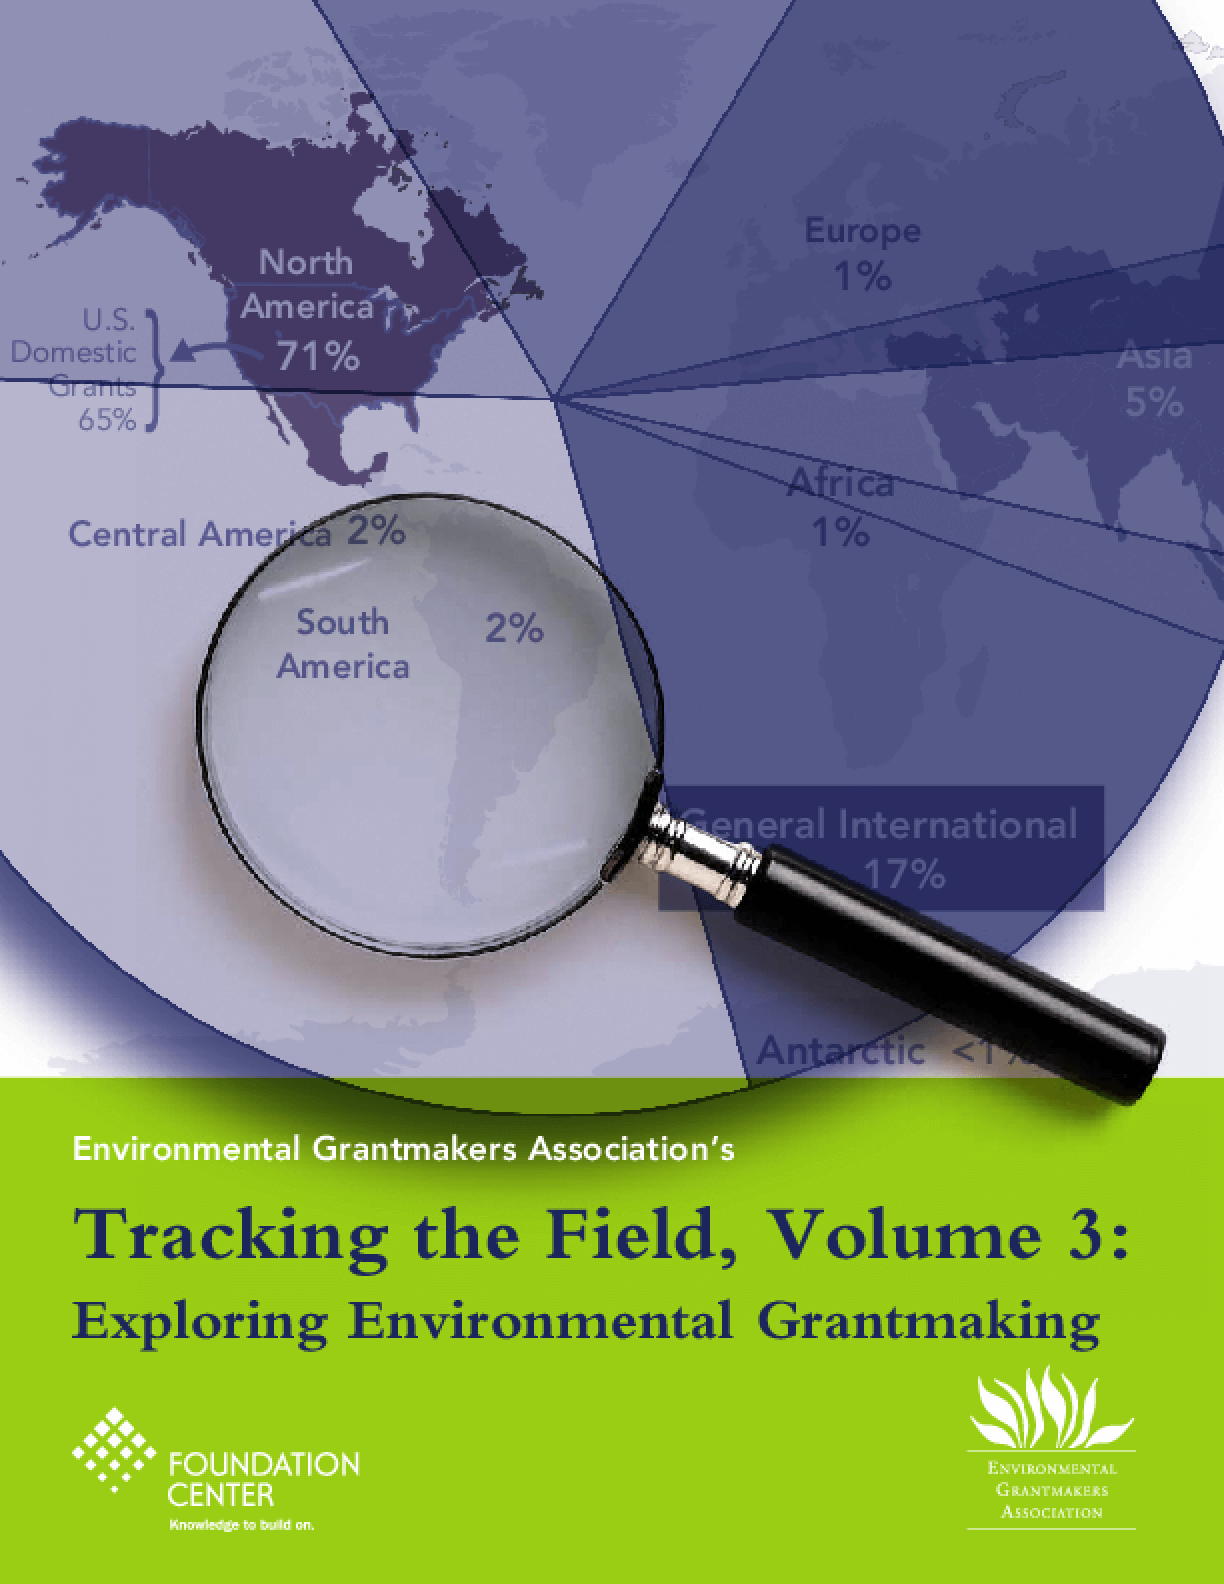 Tracking the Field, Volume 3: Exploring Environmental Grantmaking